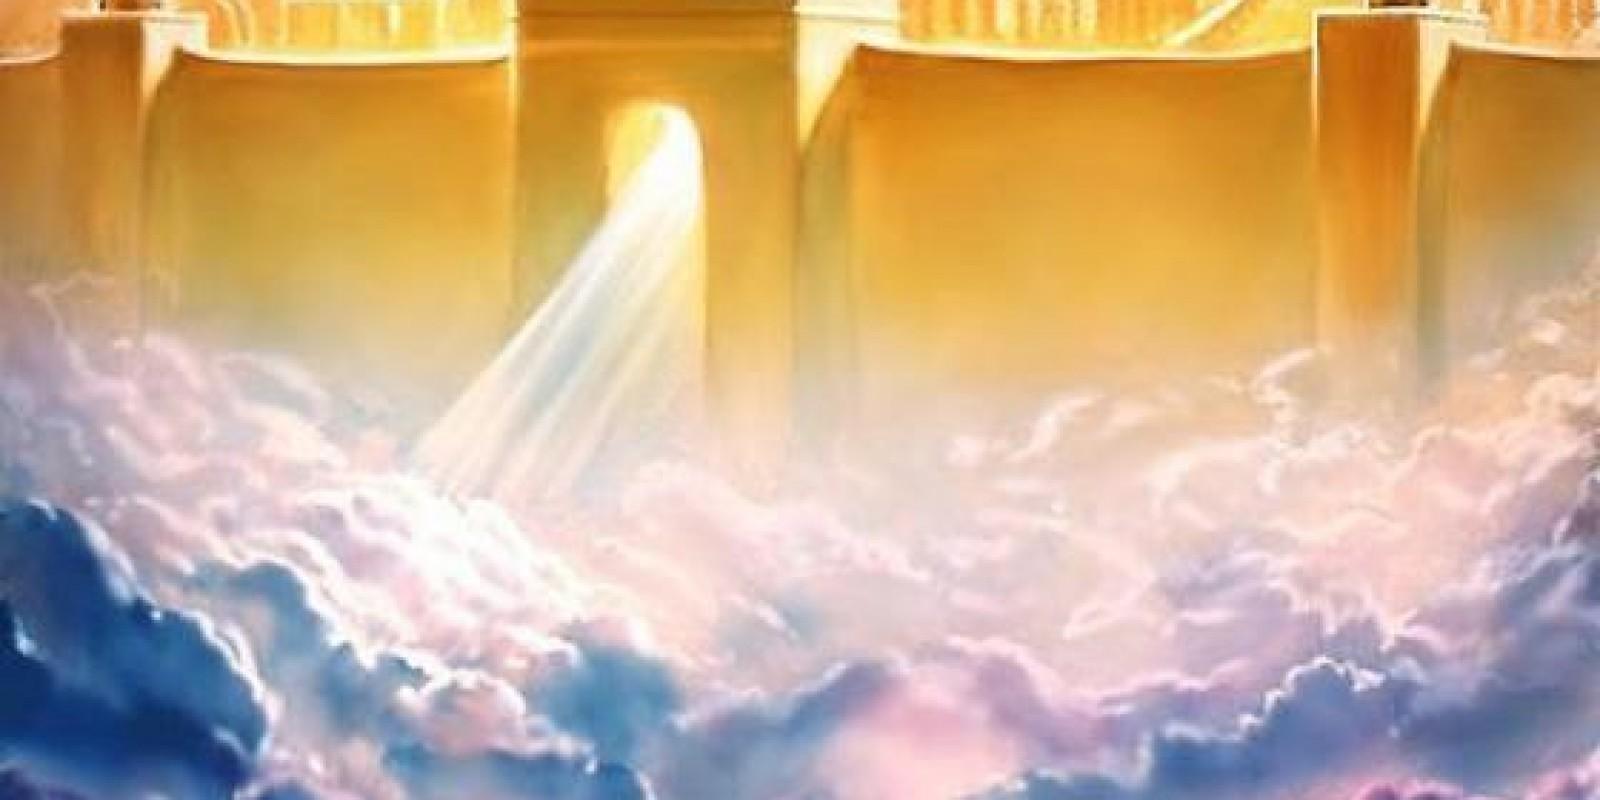 10° Dia: MATEUS 24:1-14